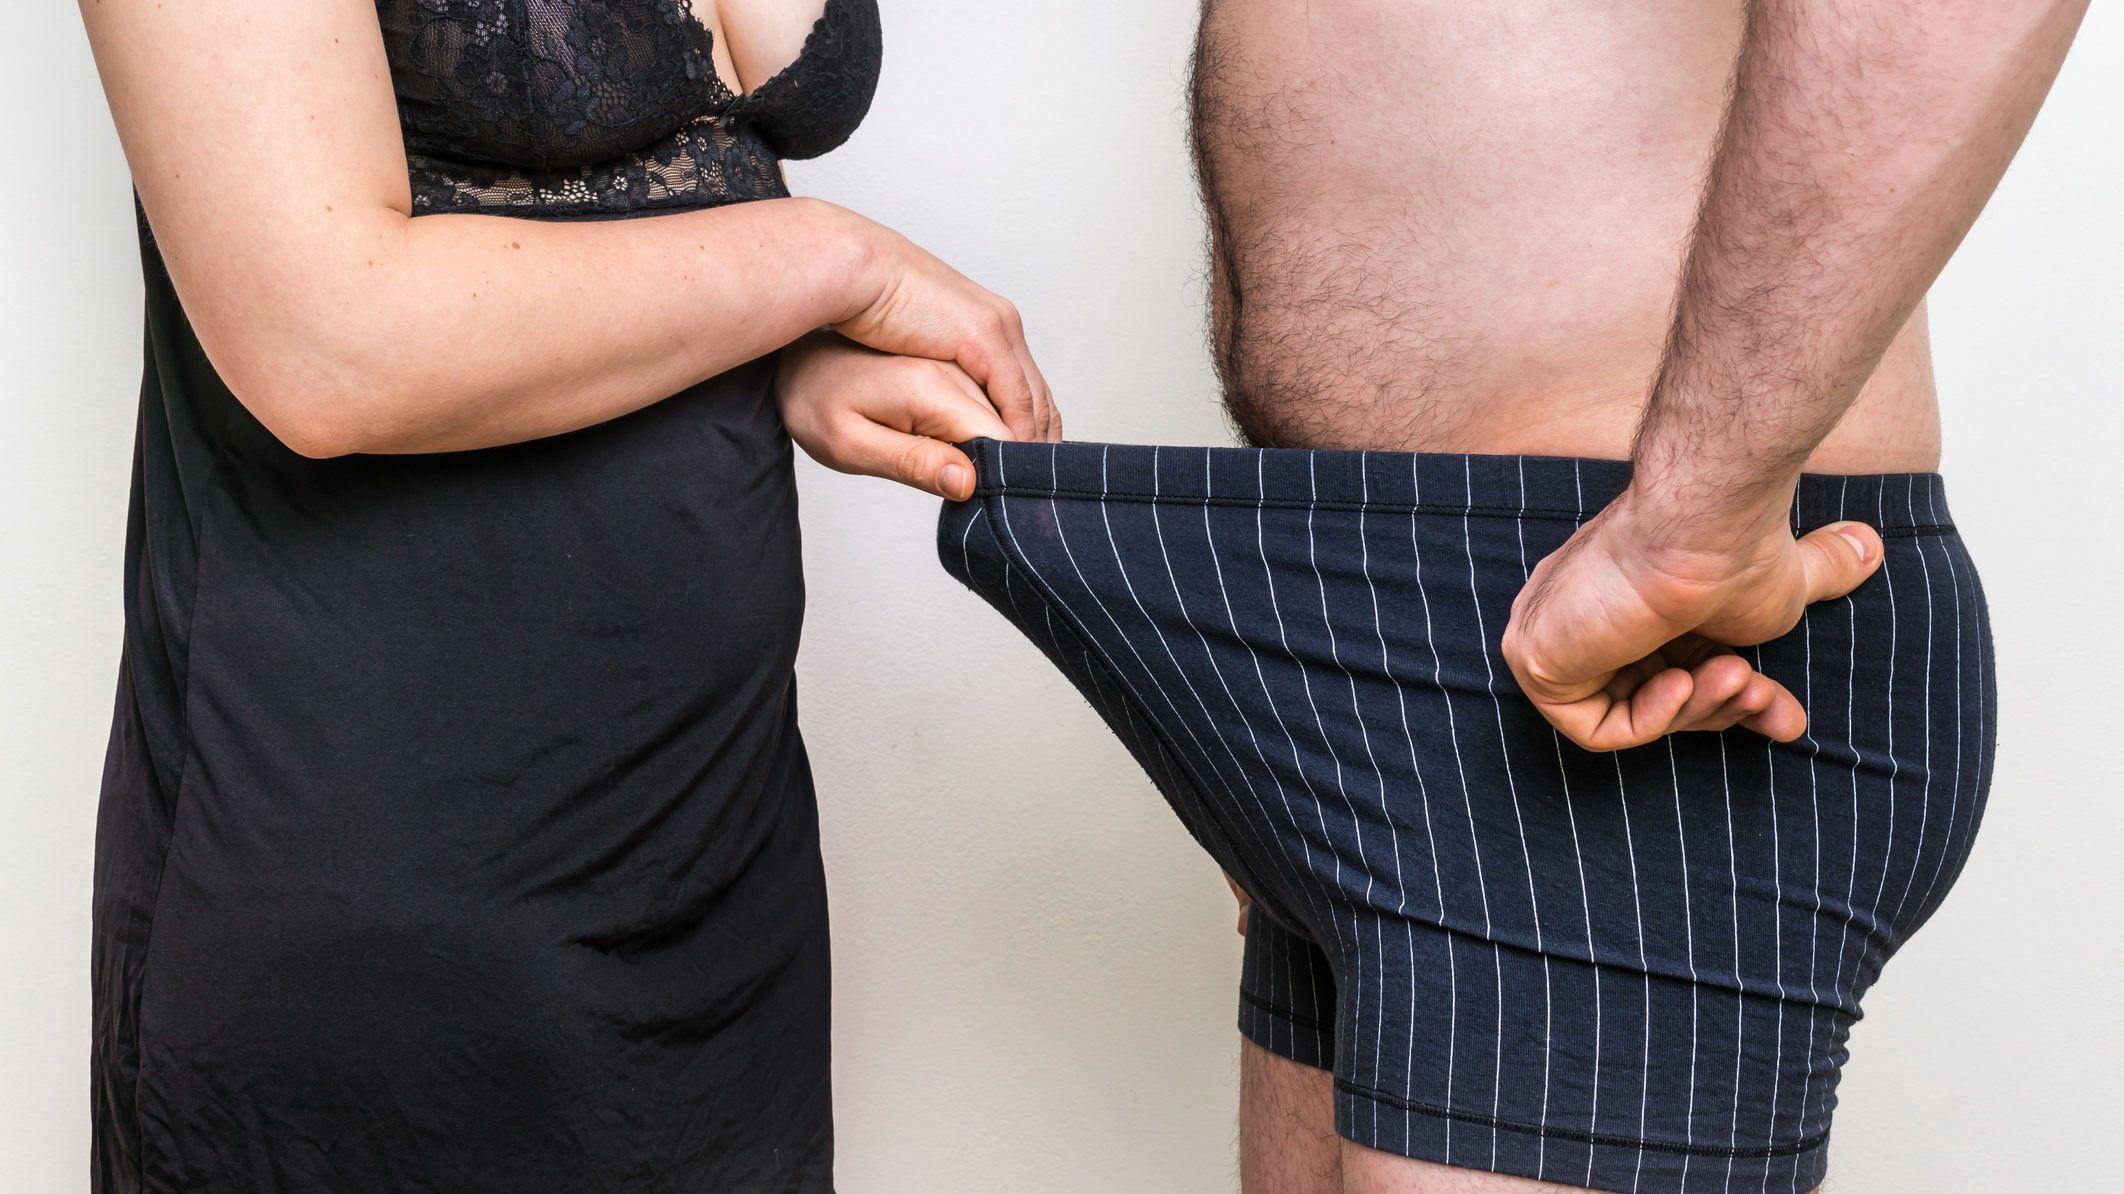 férfi pénisz hossza